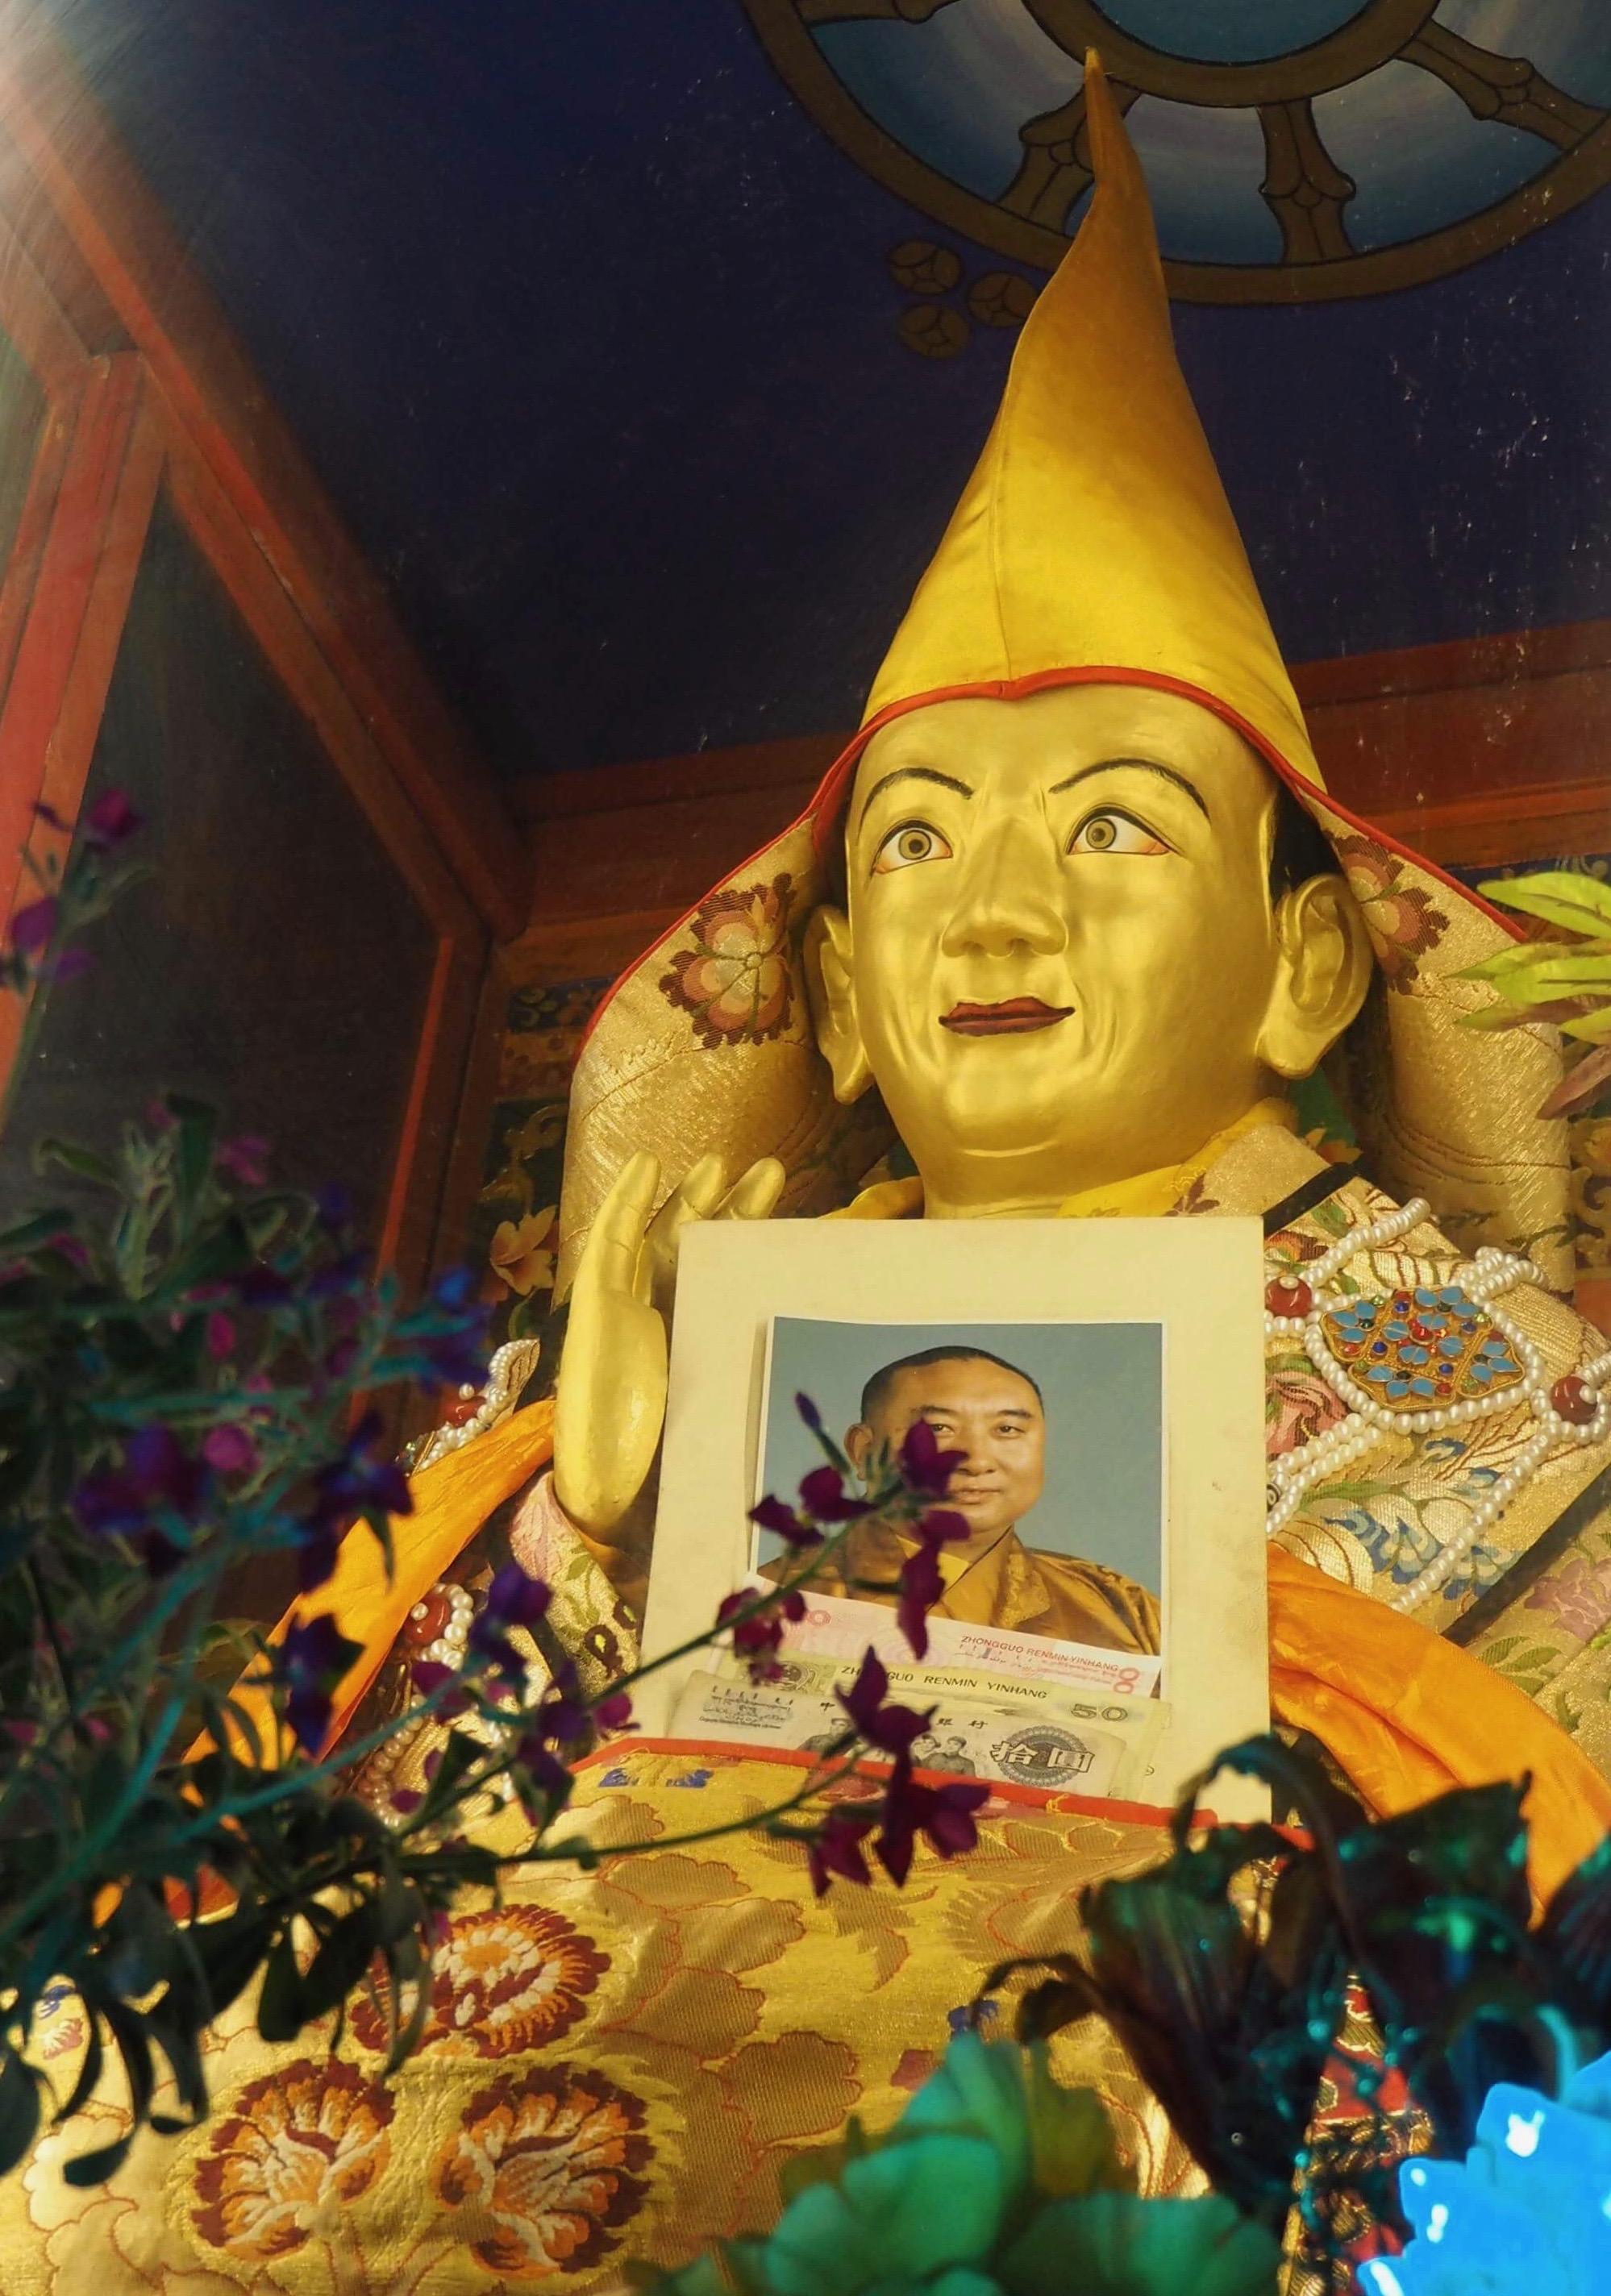 The actual holy body of Gyalwa Ensapa stillpreserved at Wensa Monastery in Tibet. (Photo Ven Tenzin Tsultrim)